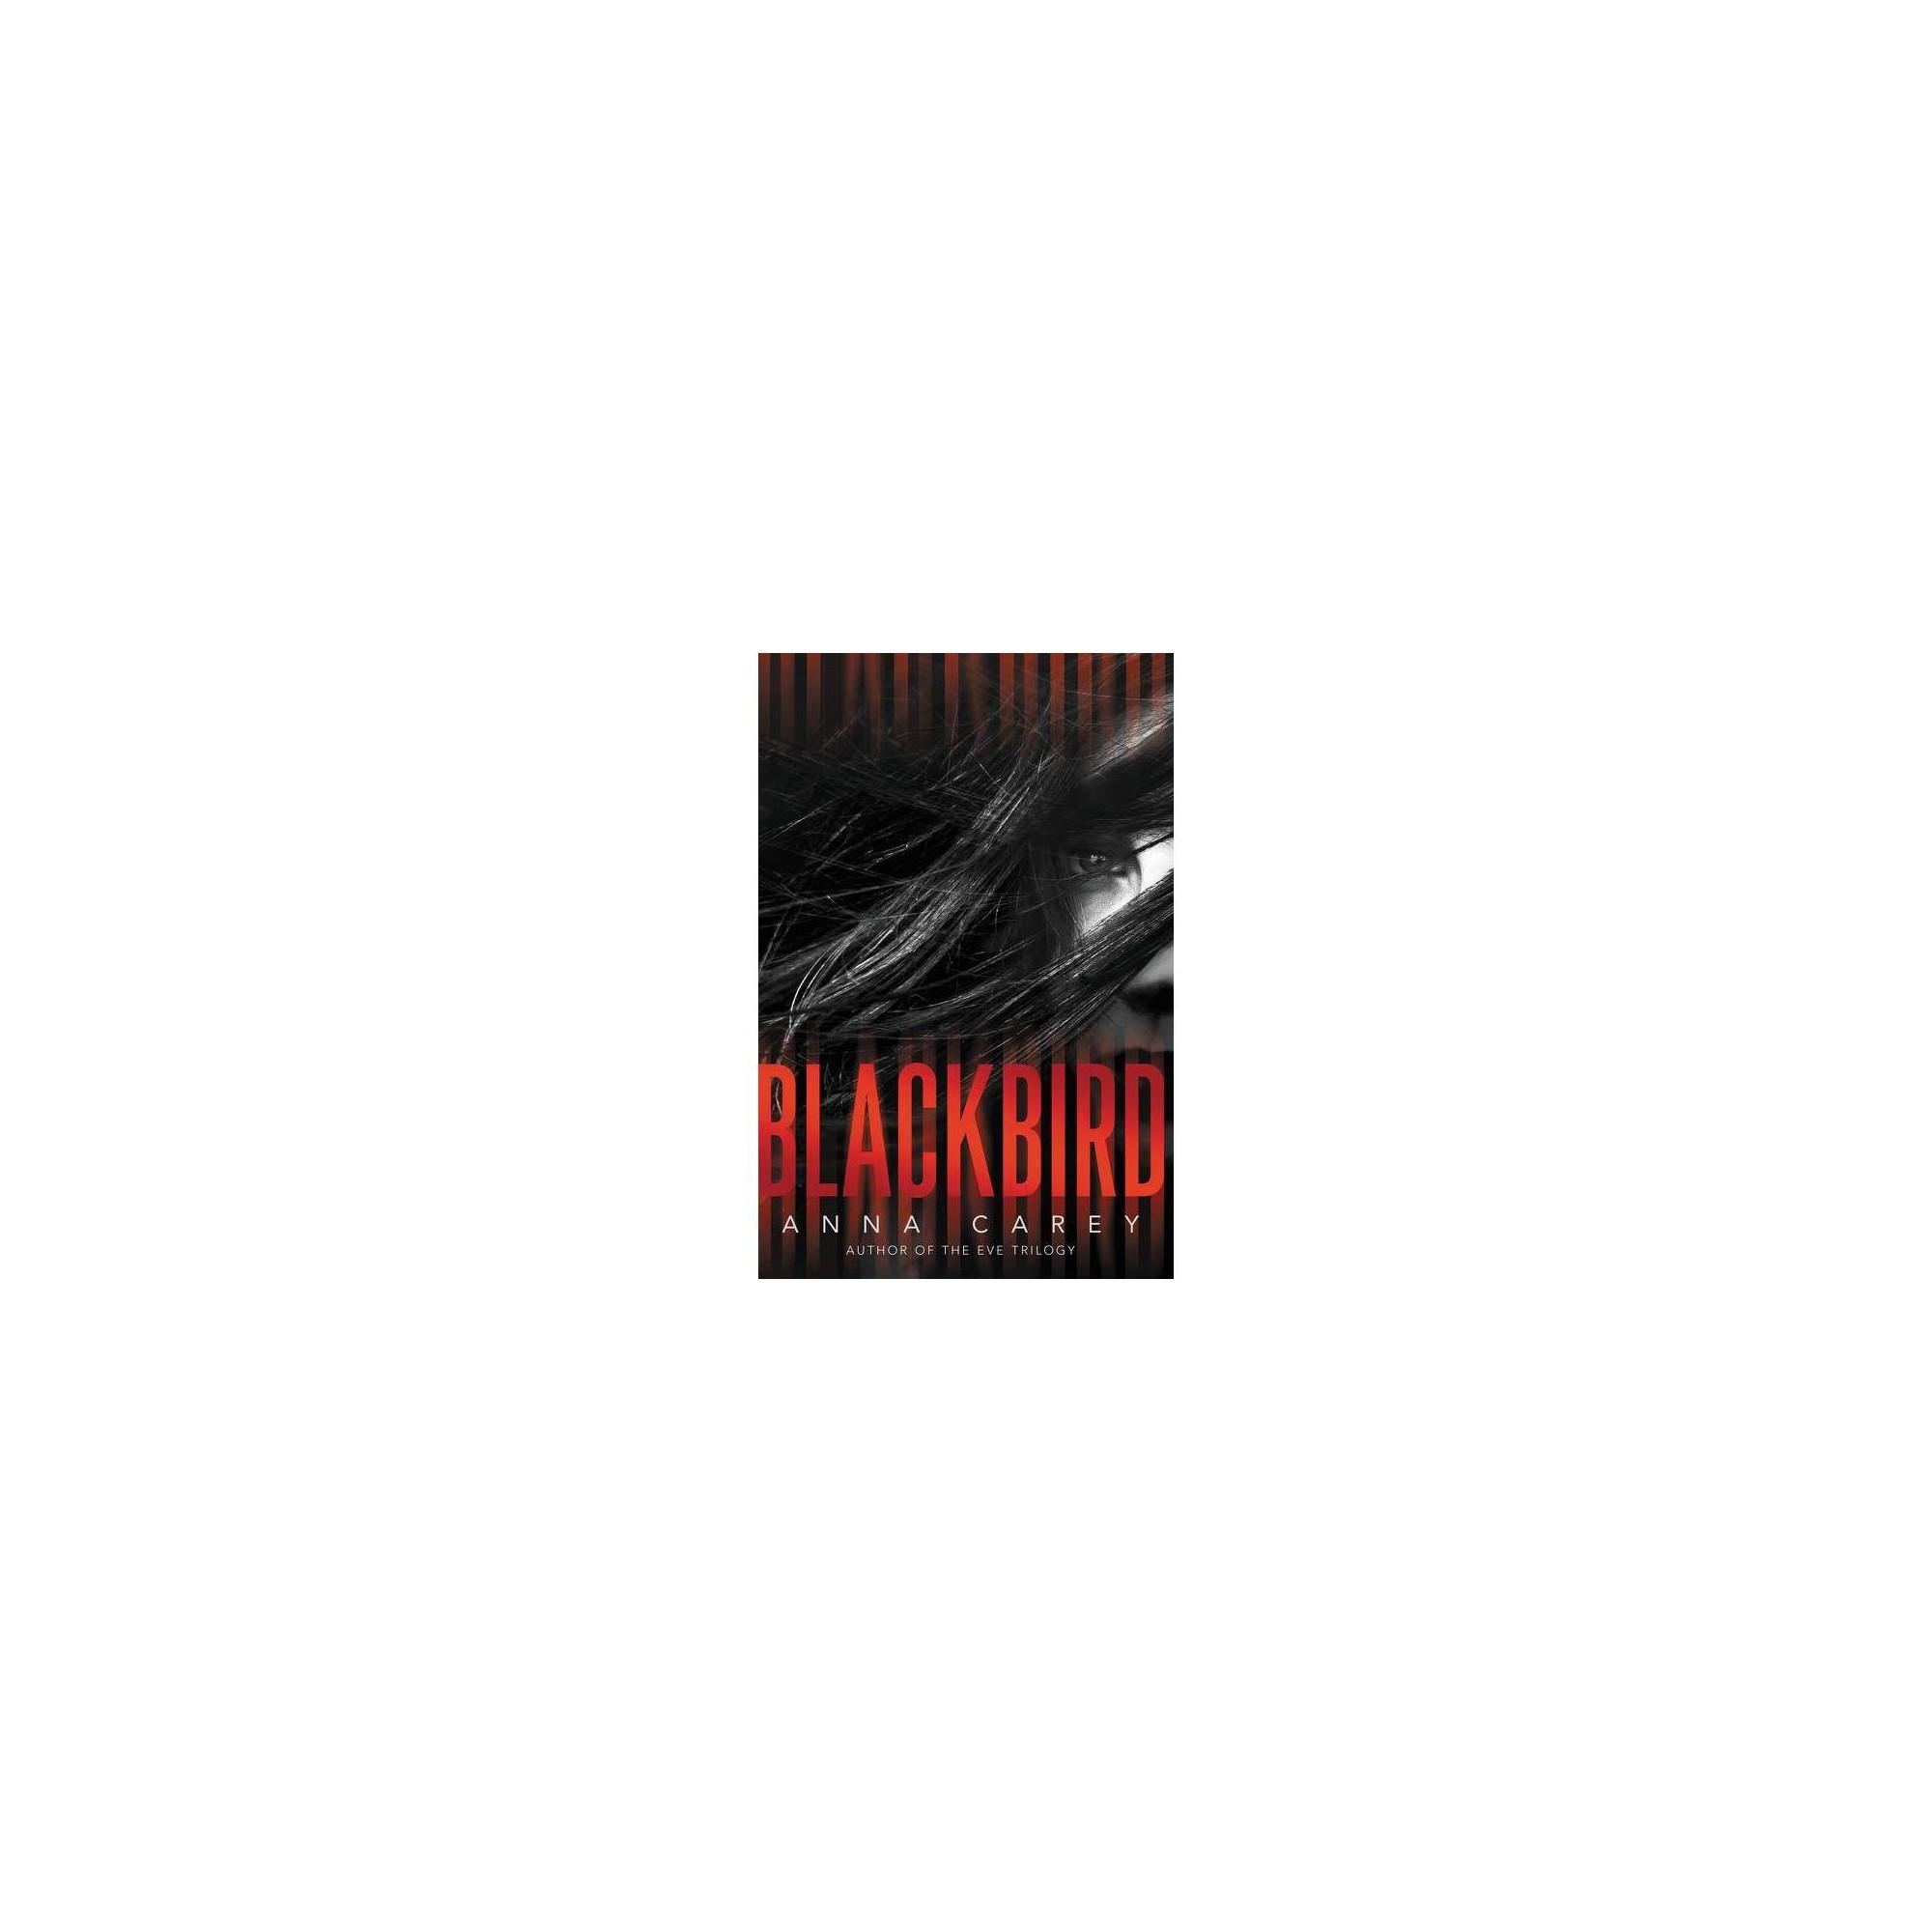 Blackbird - by Anna Carey (Paperback)